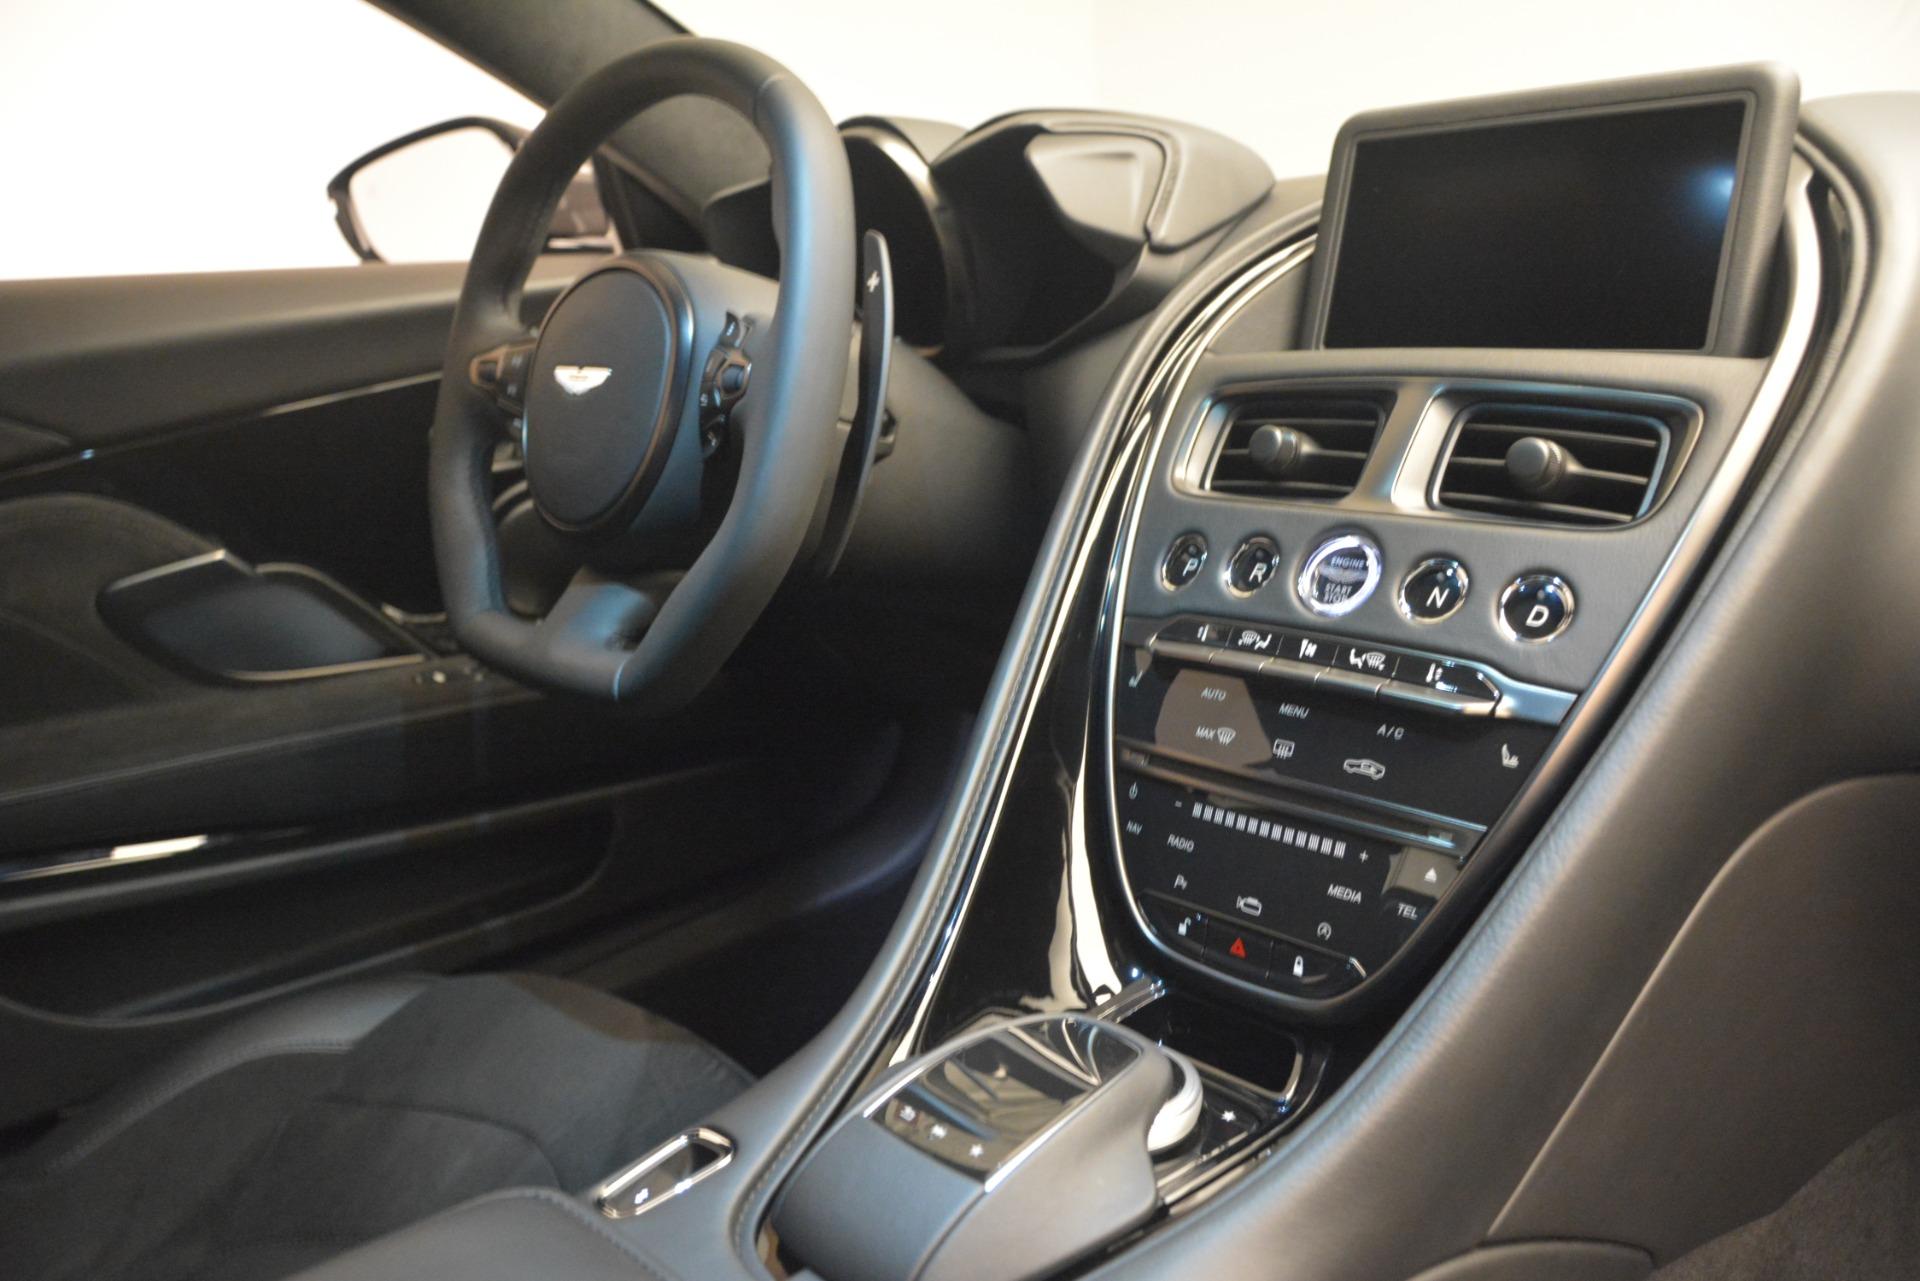 New-2019-Aston-Martin-DBS-Superleggera